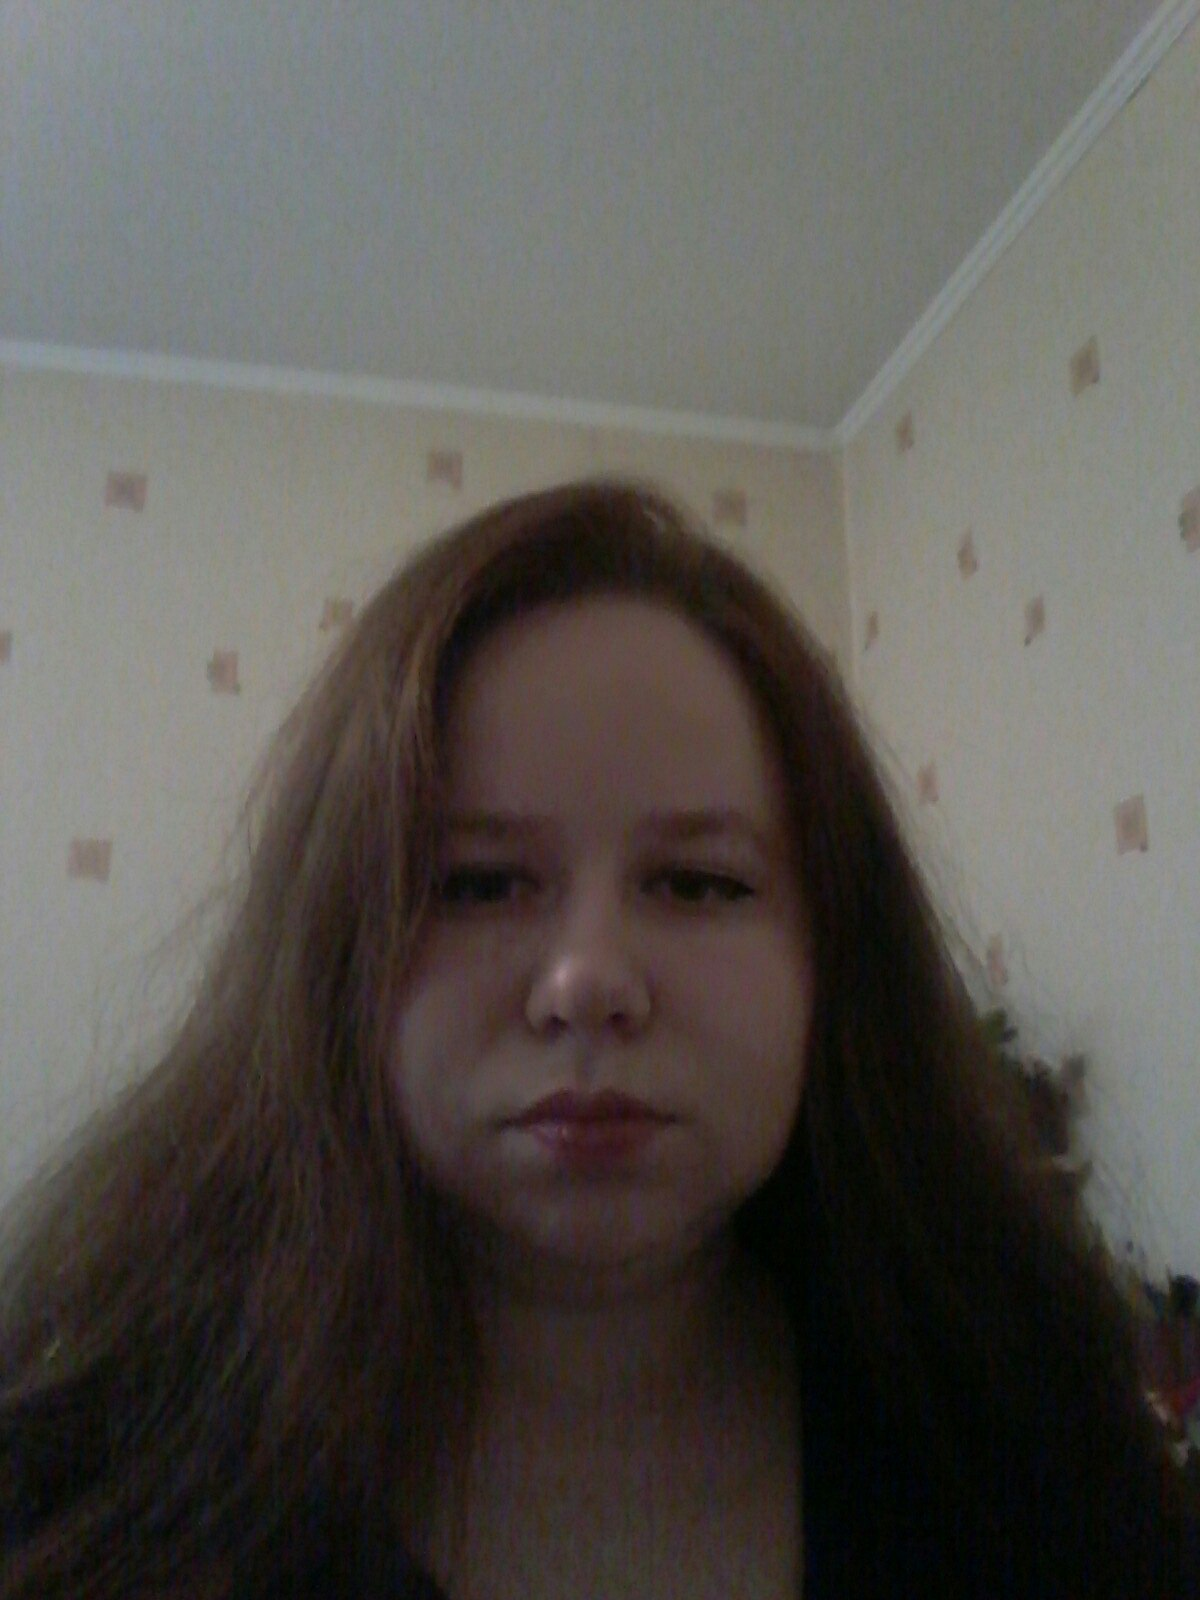 http://cs631518.vk.me/v631518311/13975/rS4a0WvSUK0.jpg